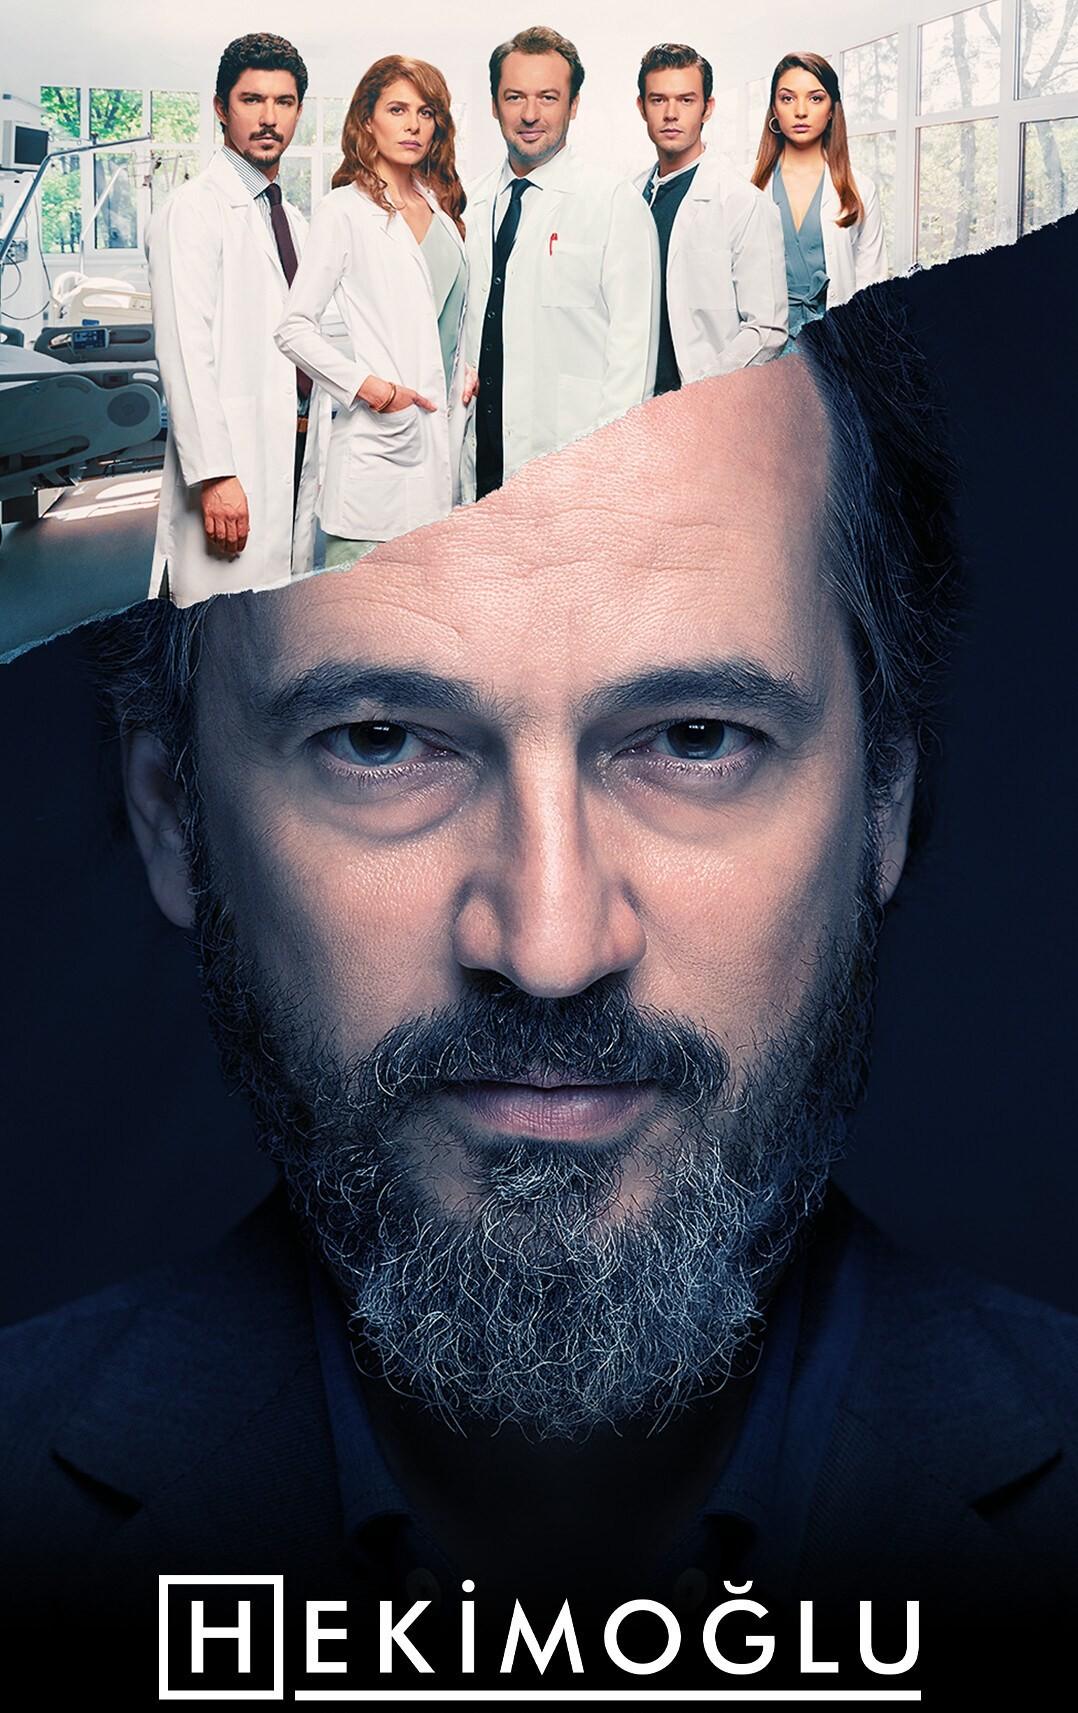 Hekimoğlu 42.Blm (23.03.2021) 720p Web-DL AAC H.264